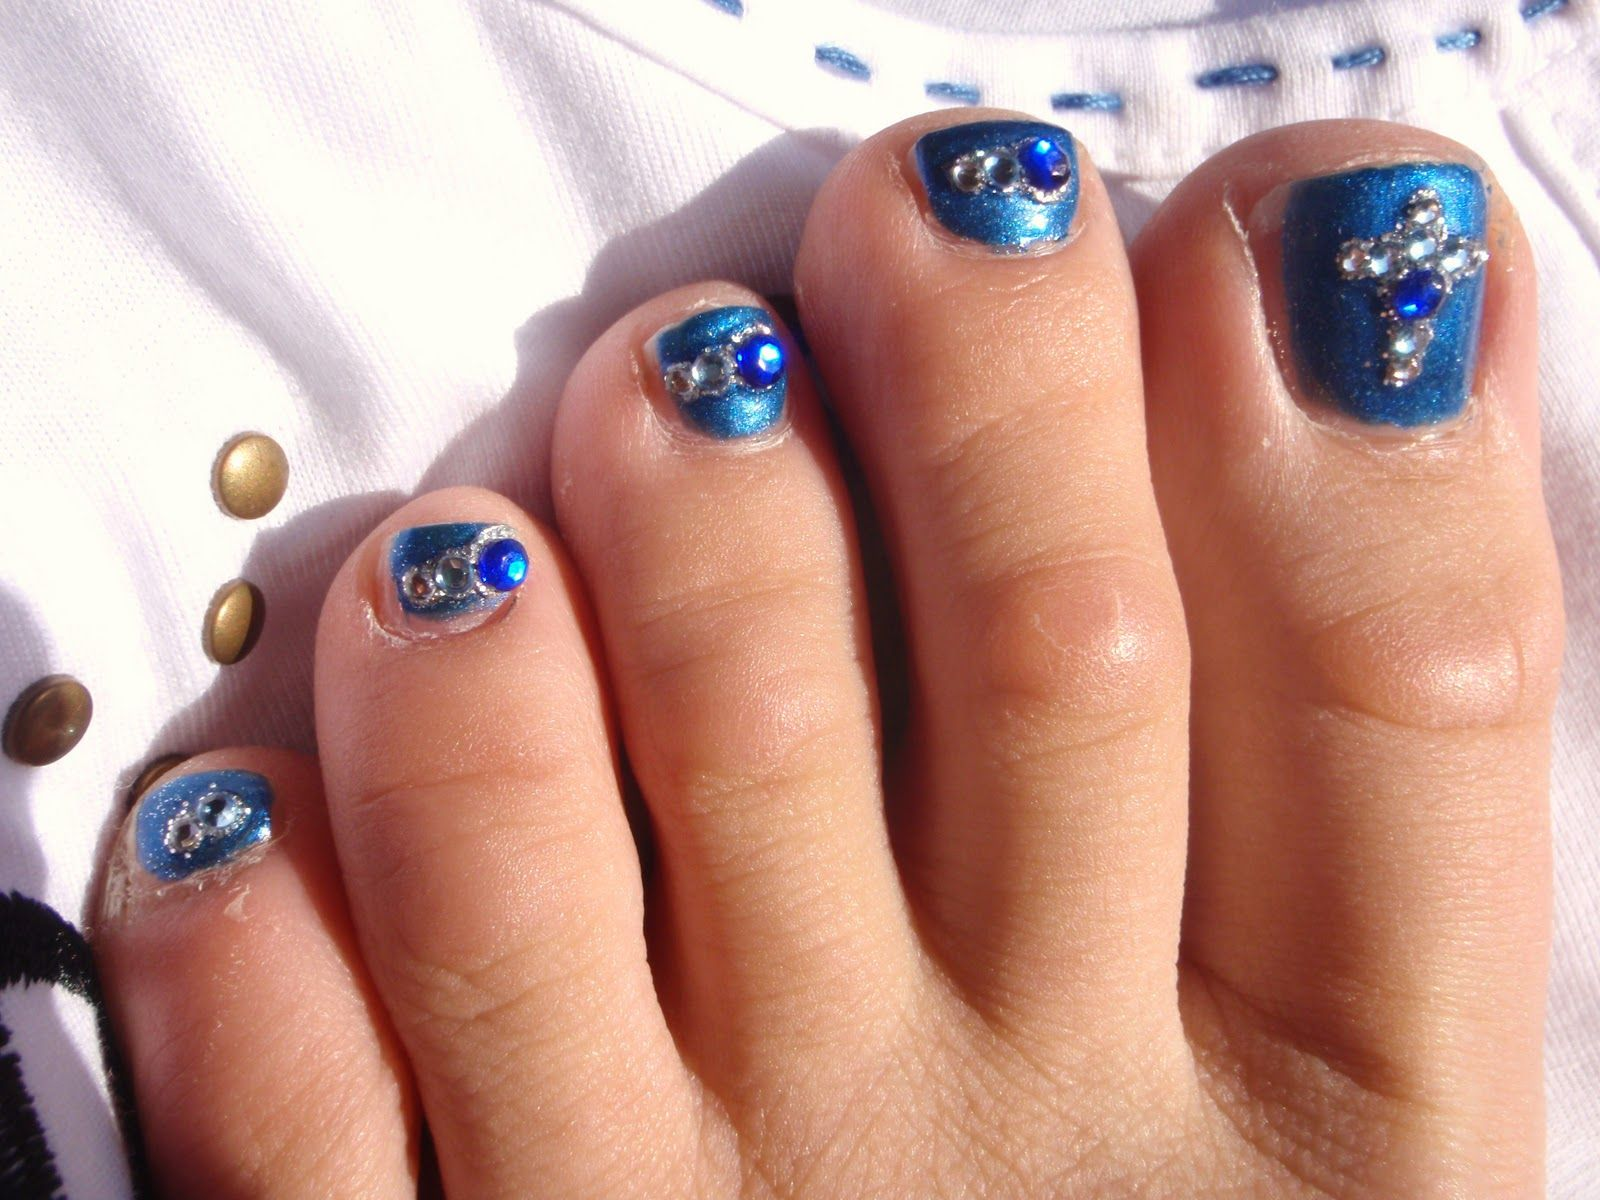 Fall Pedicure on Pinterest Fall Pedicure Designs Pedicure - toe nail ...